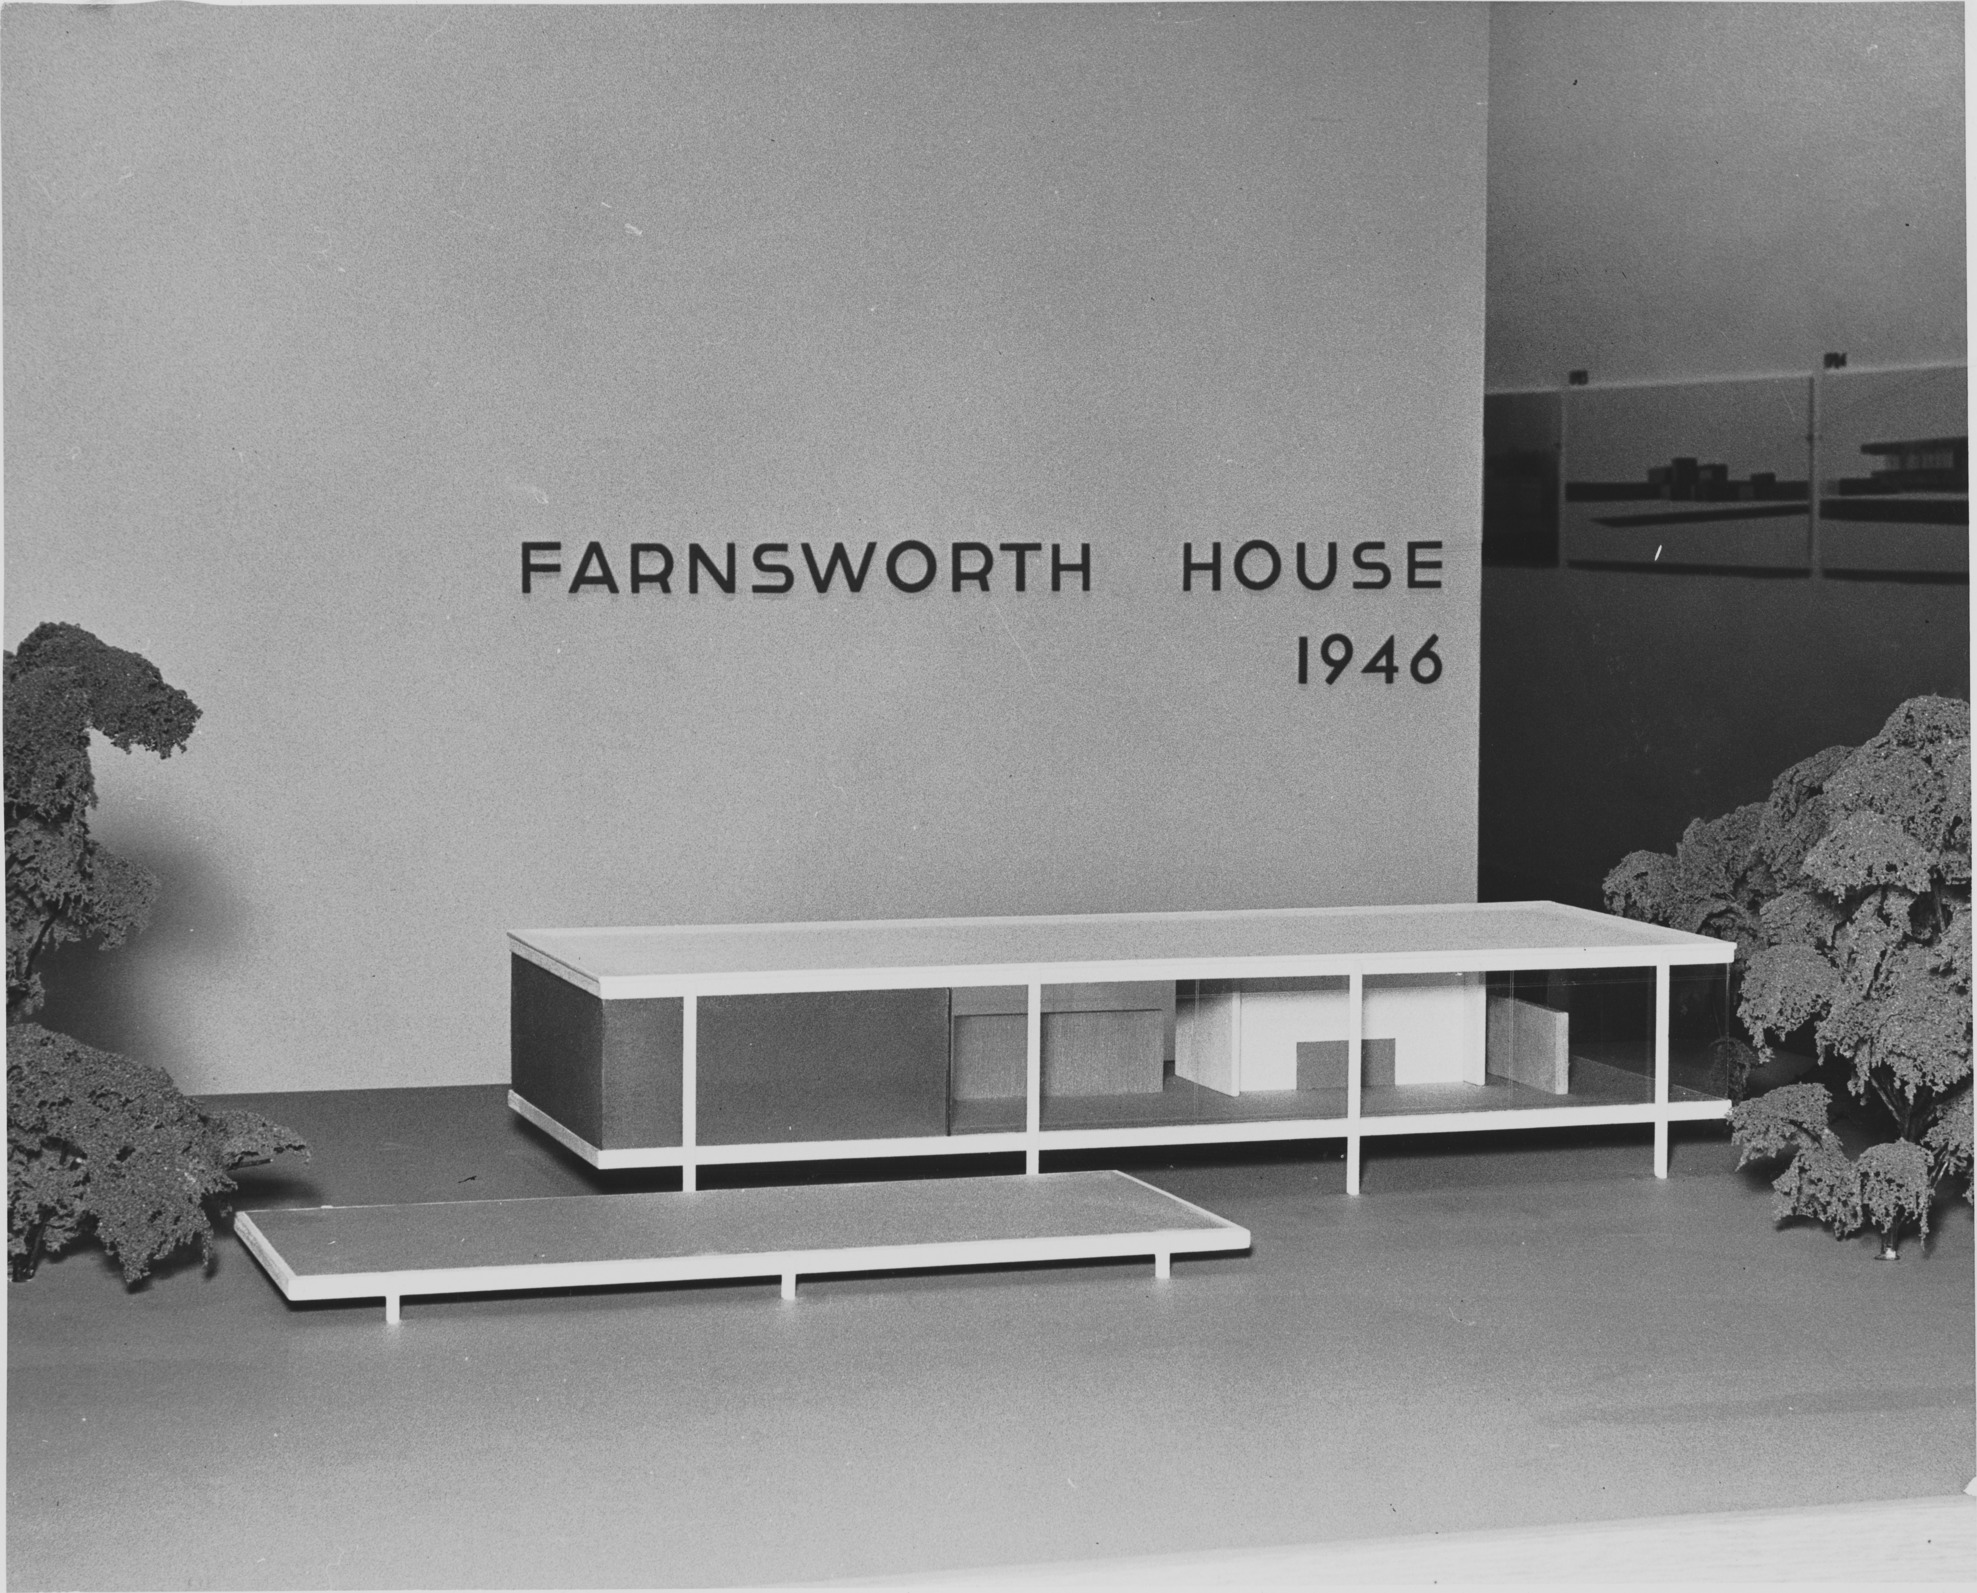 MoMA model of Farnsworth House